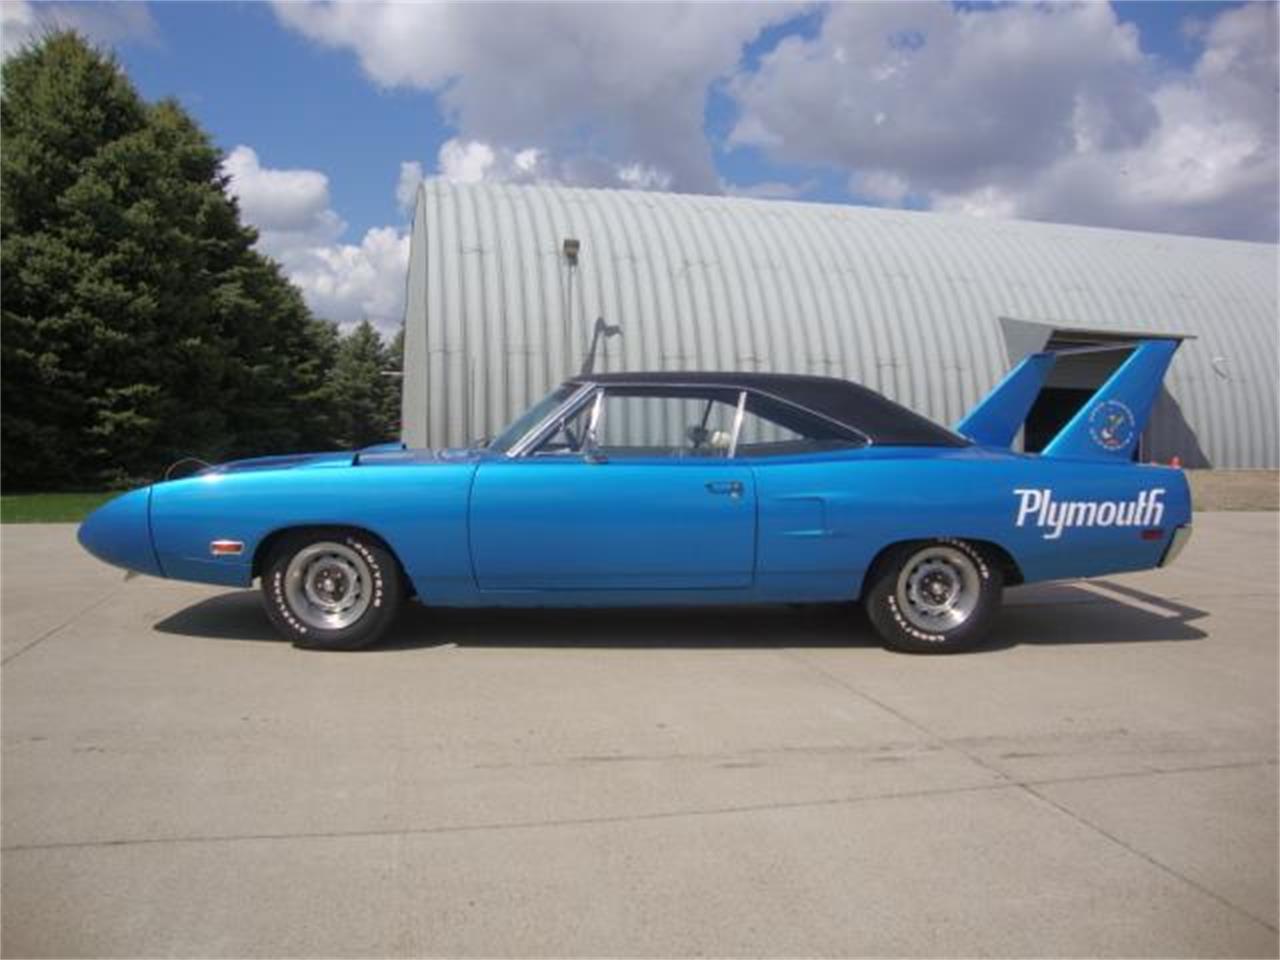 1970 Plymouth Superbird (CC-1387024) for sale in Milbank, South Dakota